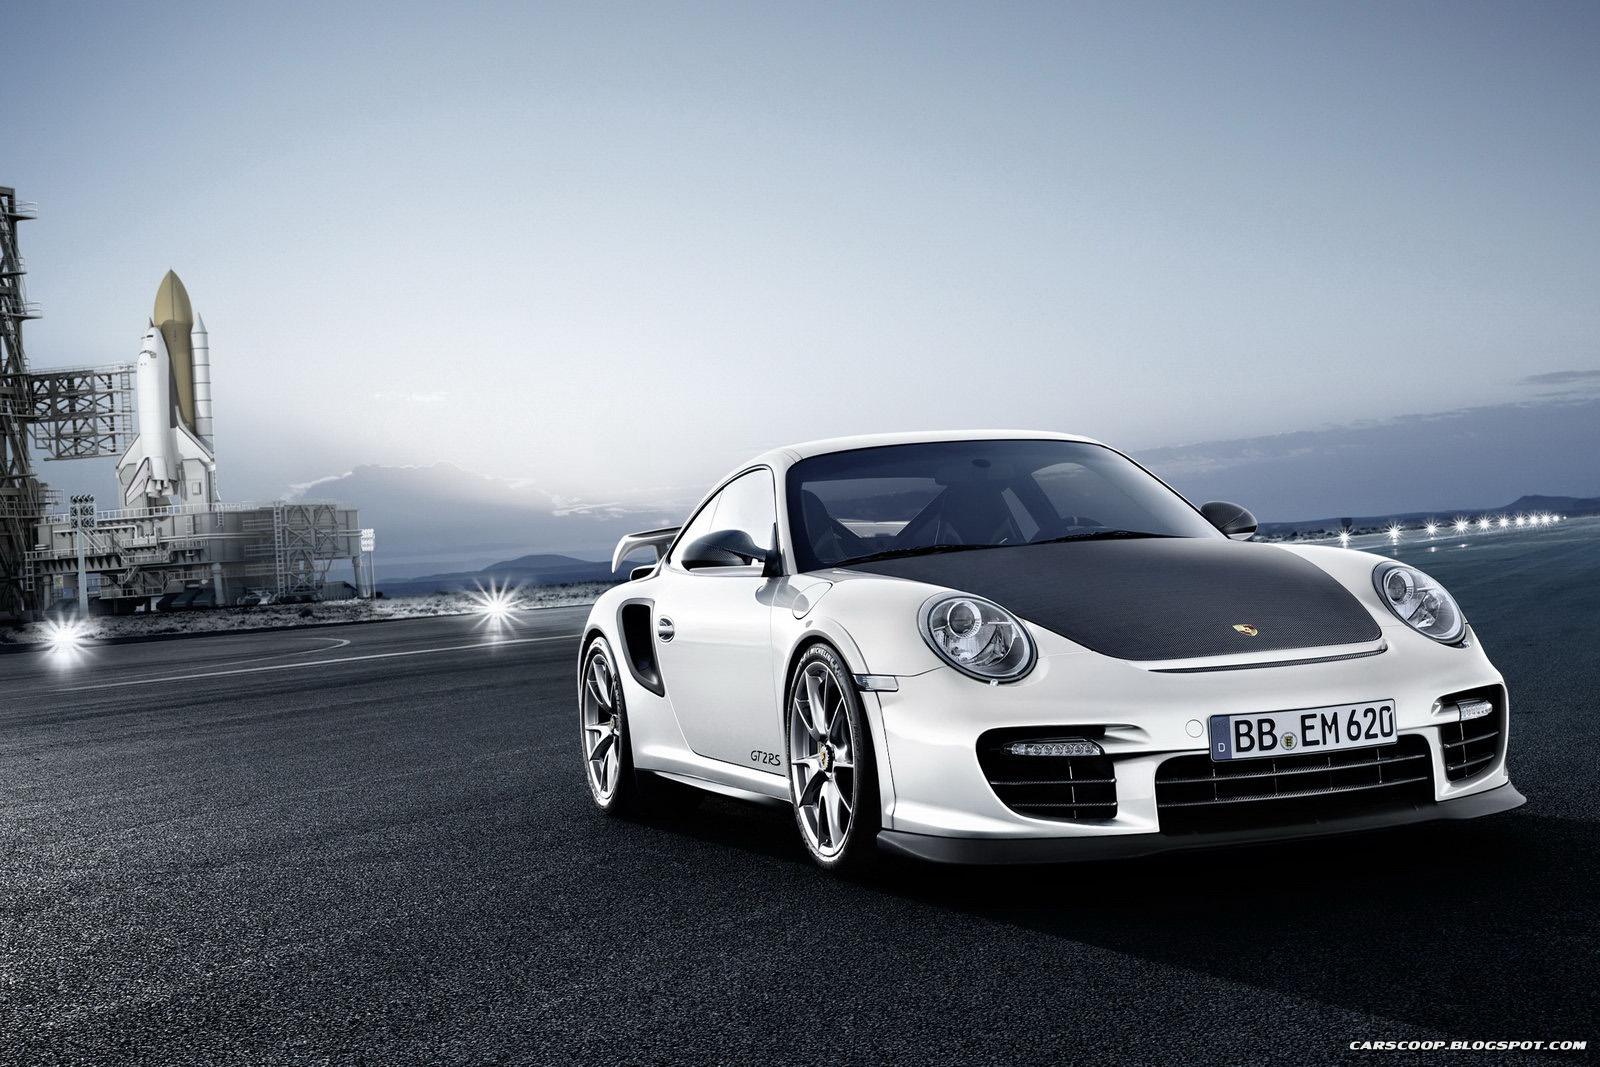 New Porsche 911 Gt2 Rs Hd Luxury Car Wallpaper Luxury Autocars